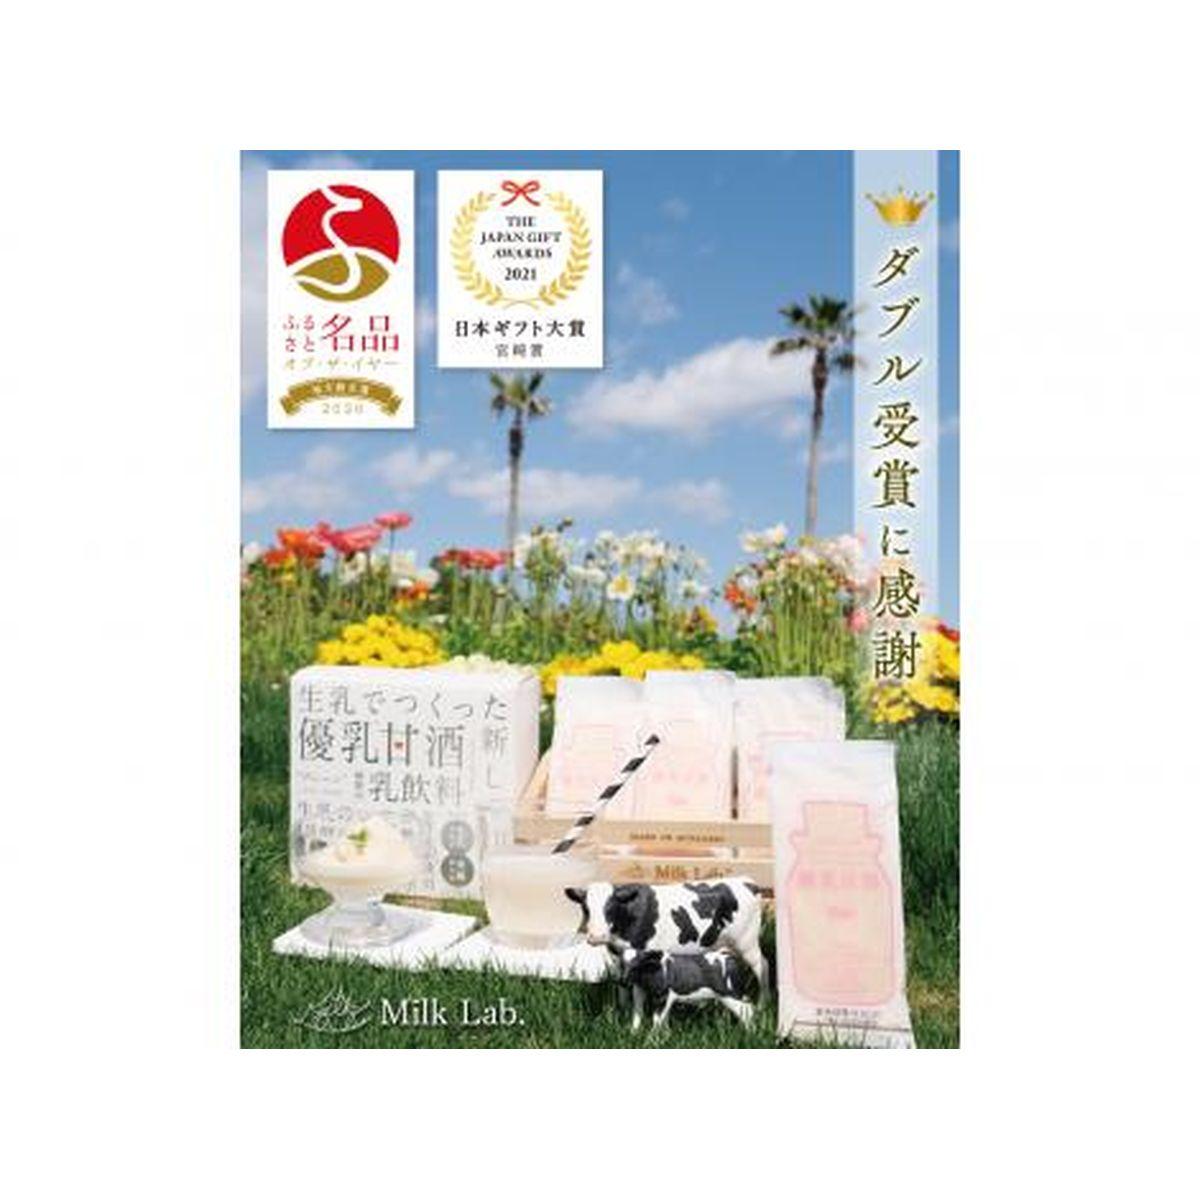 Milk Lab (夏バテ予防に!美容と健康に!)フローズン優乳甘酒10パックセット